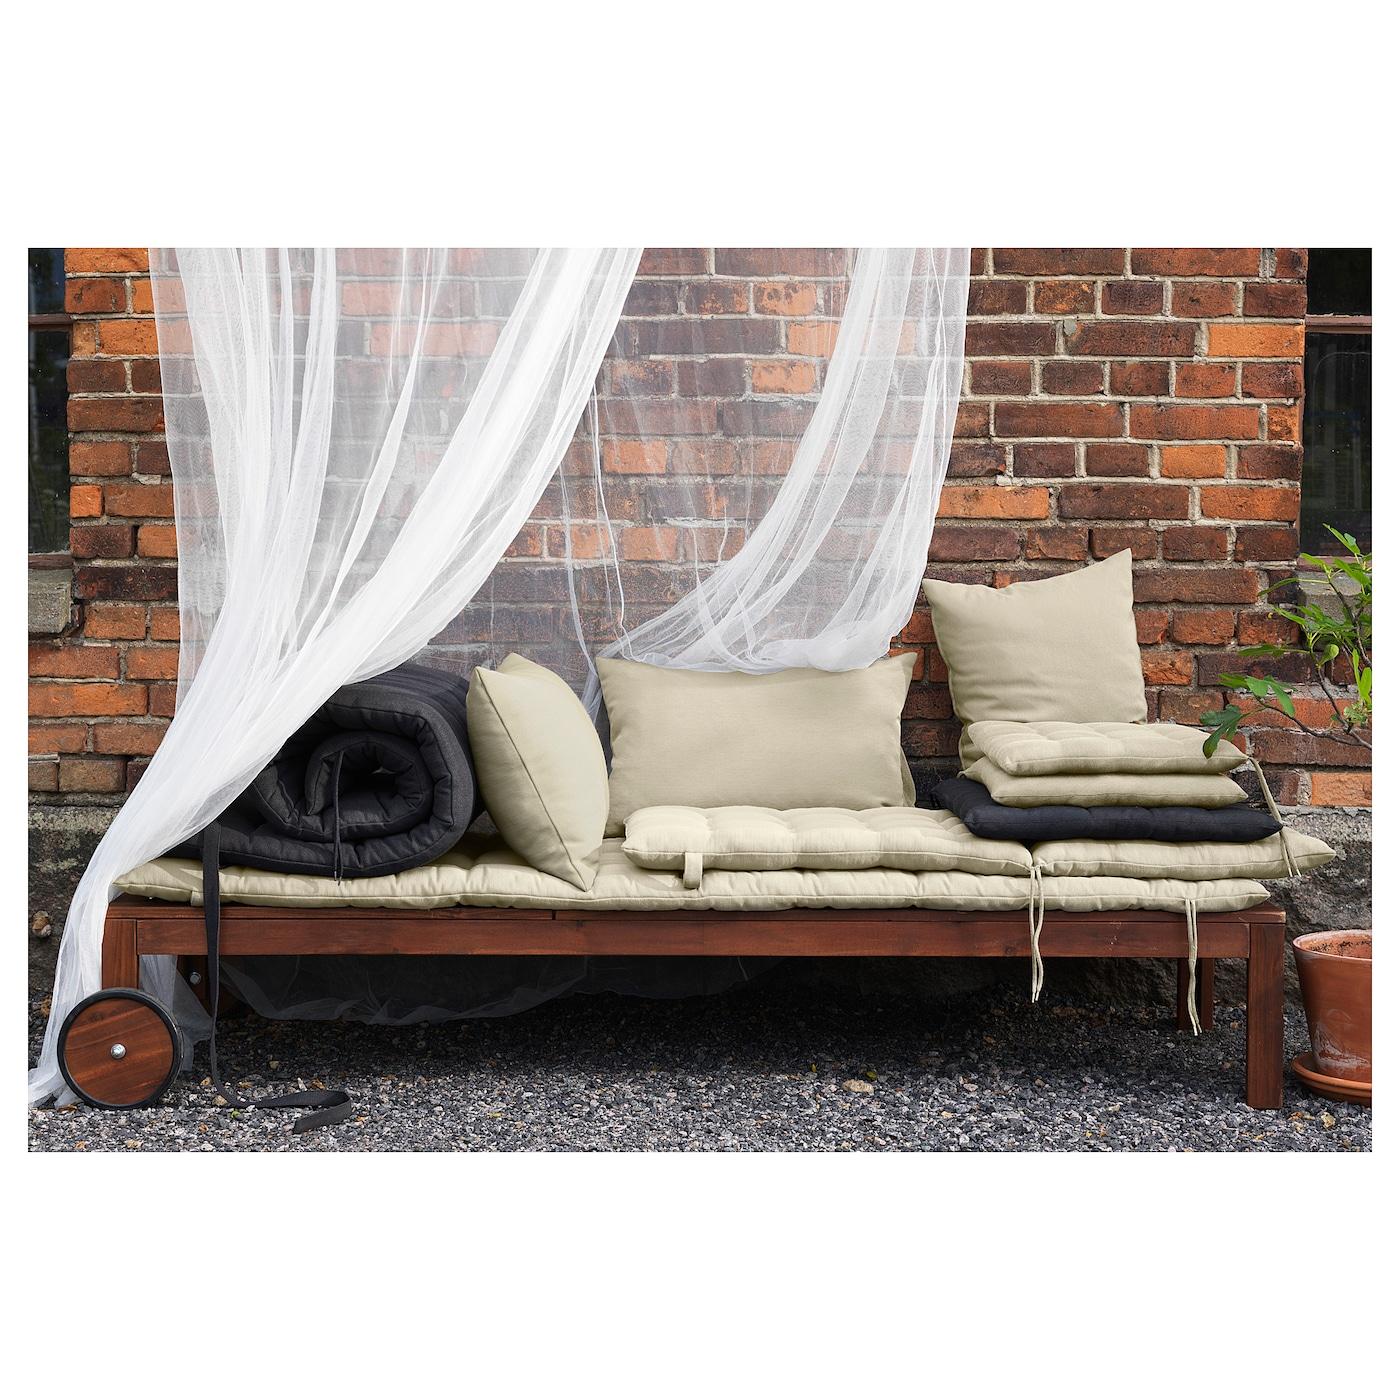 h ll matelas fin bain de soleil beige 190 x 60 cm ikea. Black Bedroom Furniture Sets. Home Design Ideas